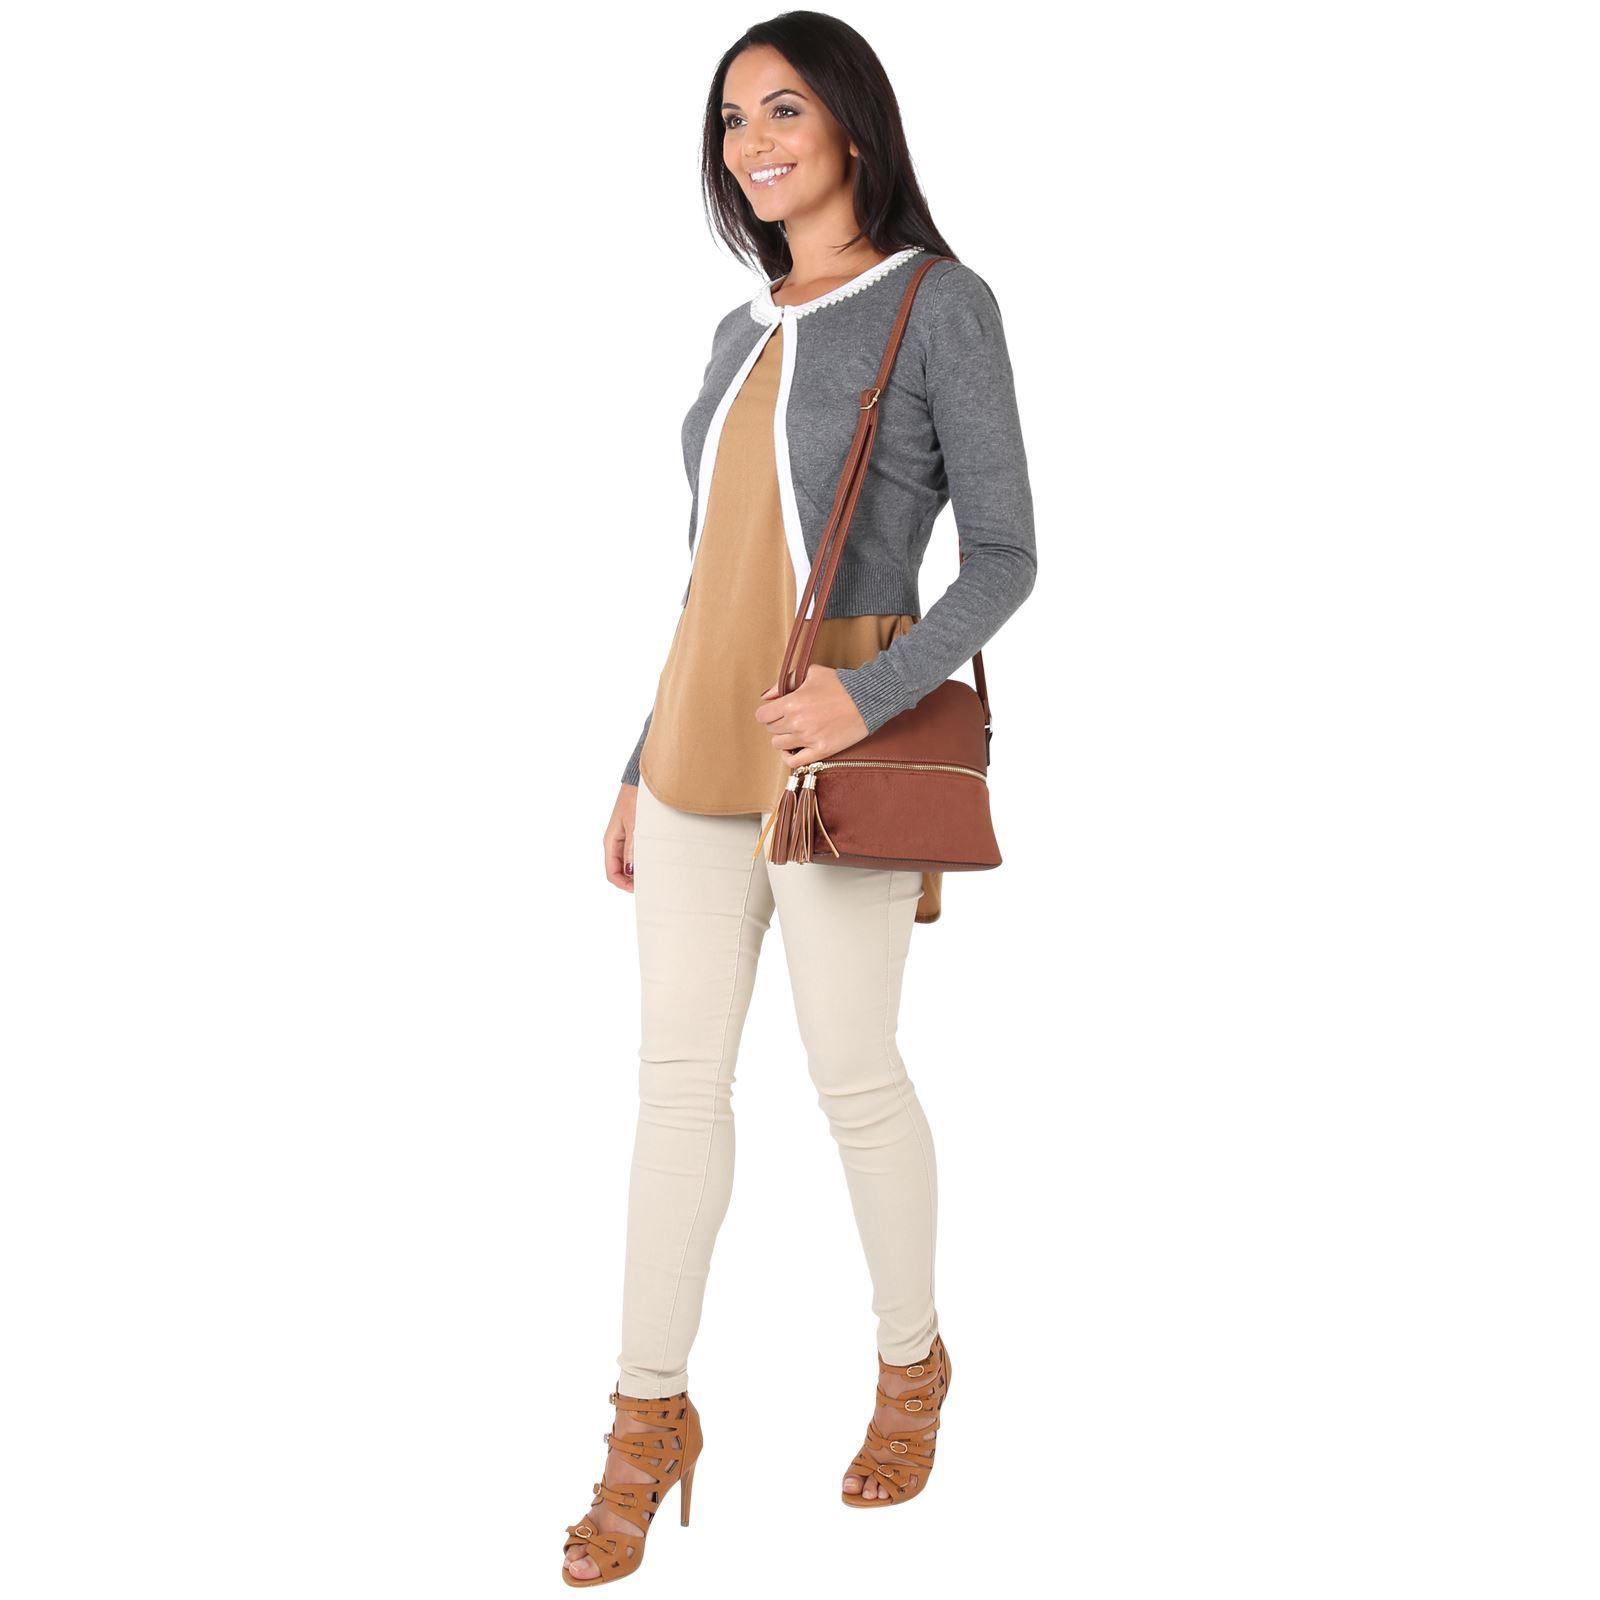 Womens-Ladies-Bolero-Shrug-Silky-Soft-Cardigan-Long-Sleeve-Knit-Short-Top-Work thumbnail 11